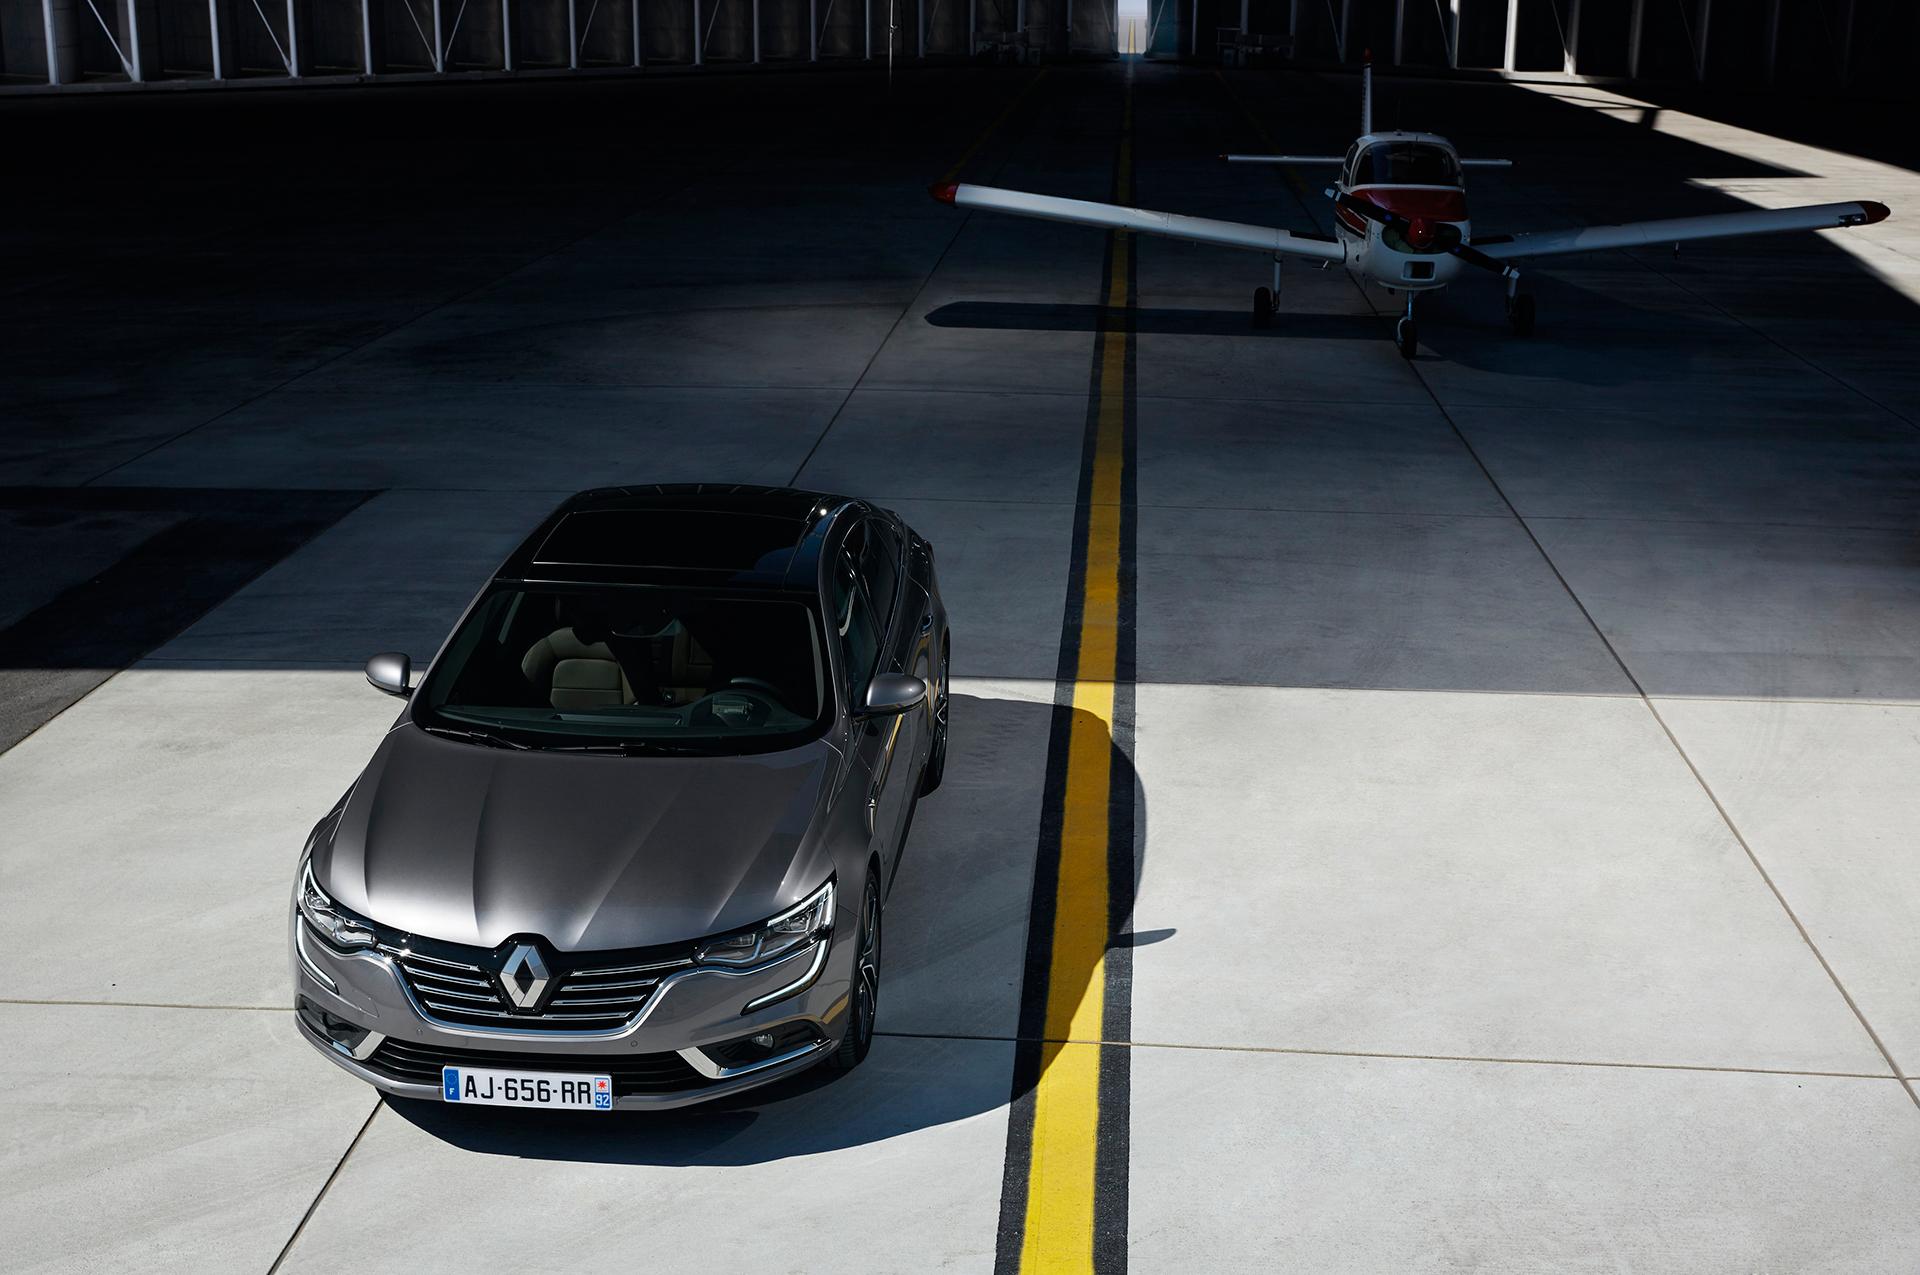 Renault Talisman - 2015 - extérieur / exterior